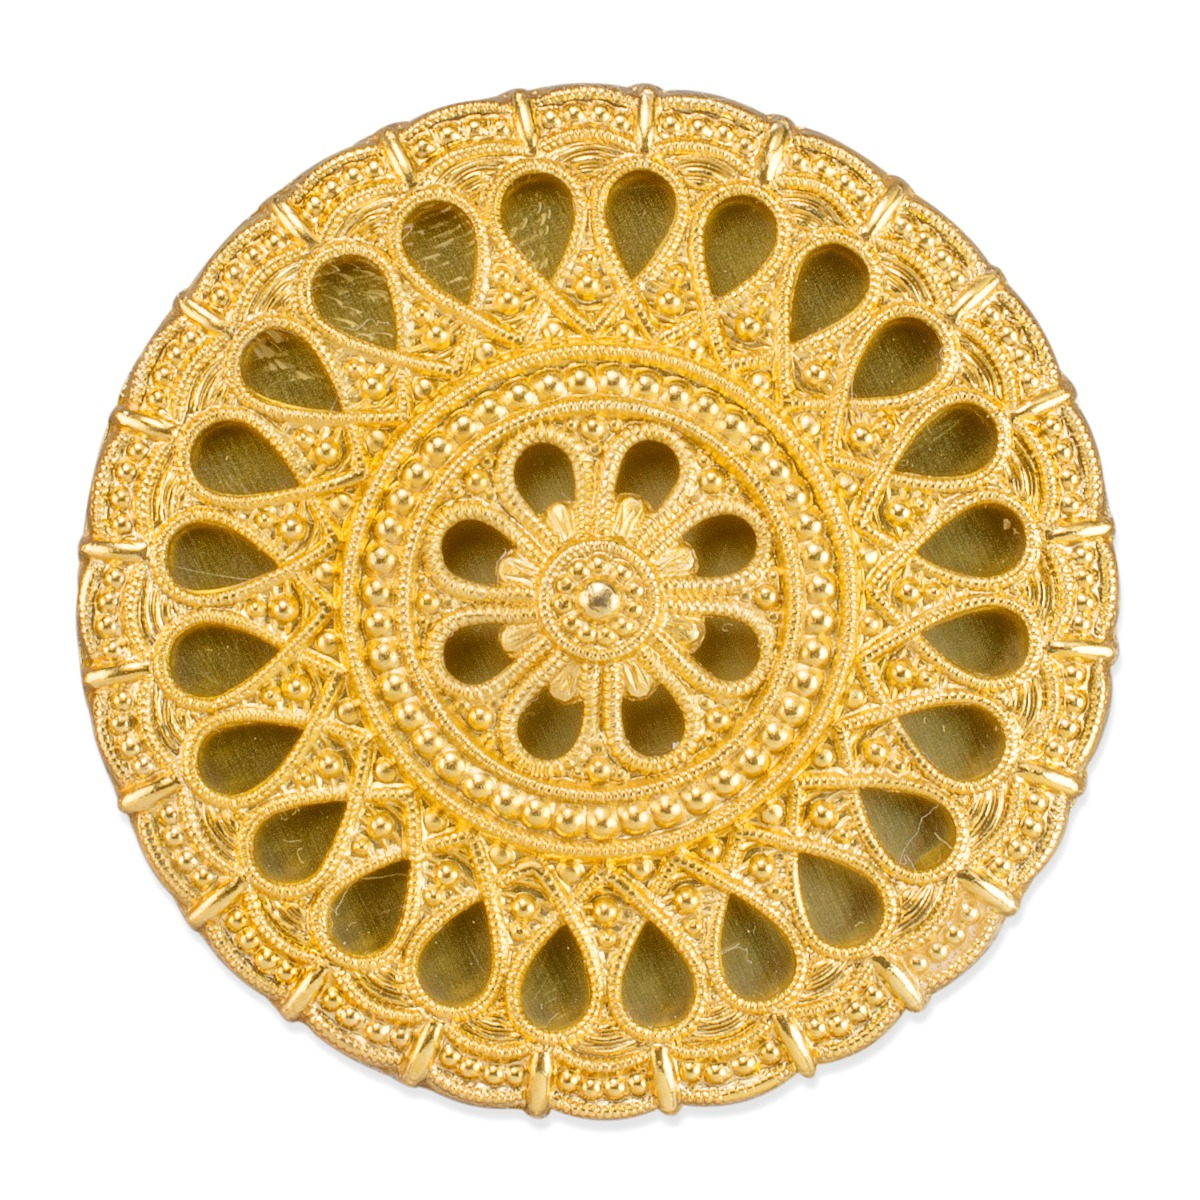 Assyrian gold brooch